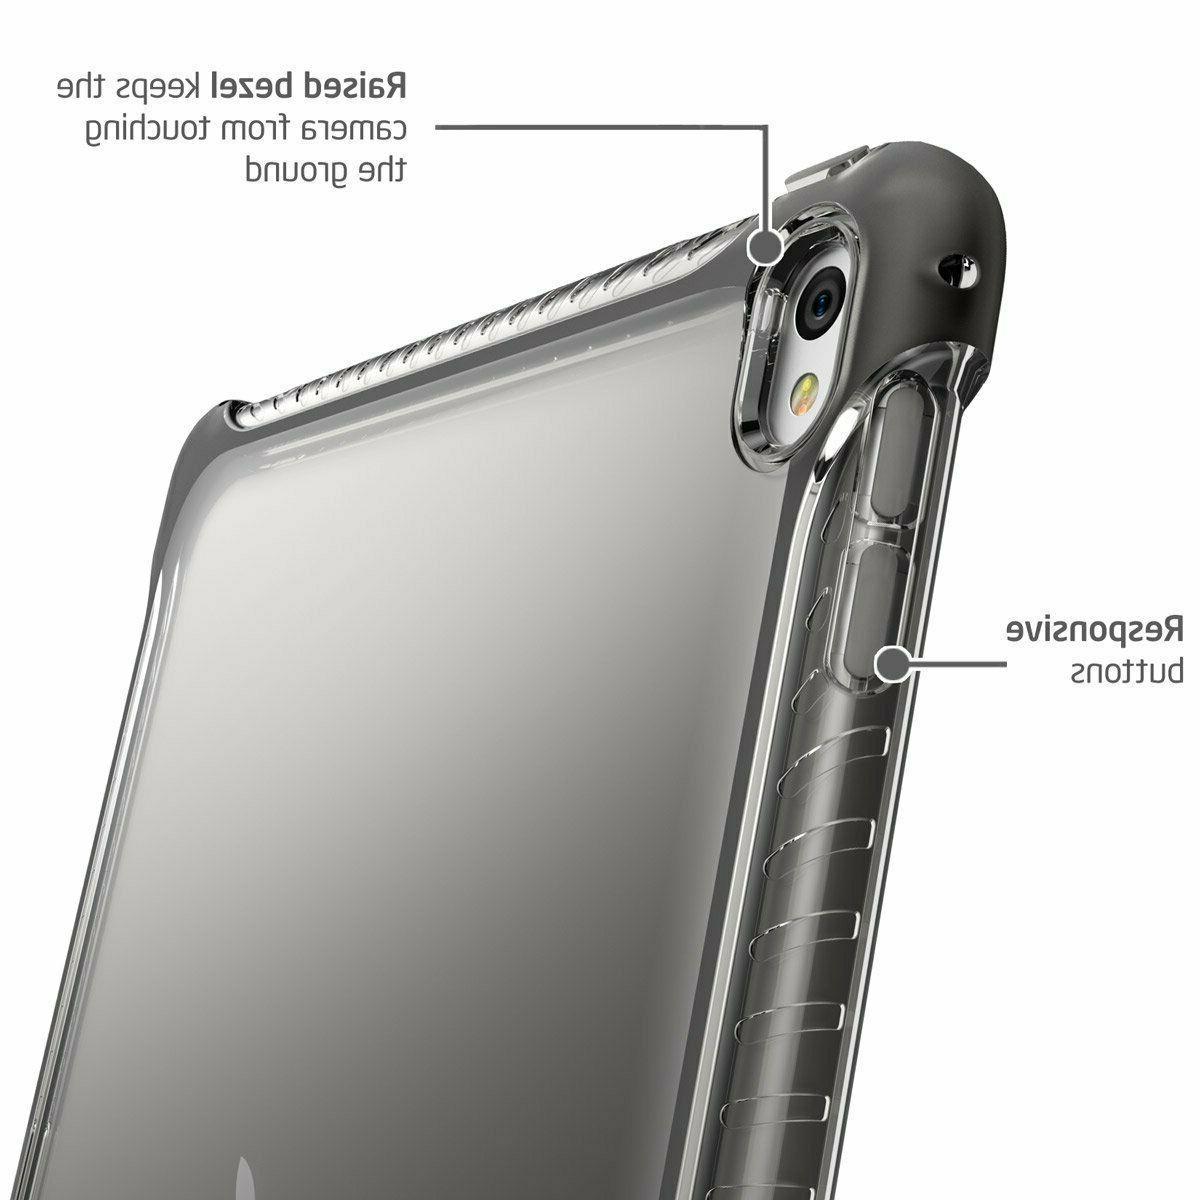 i-Blason iPad Pro 9.7 Inch Cover SoftGel Slim Protective Case